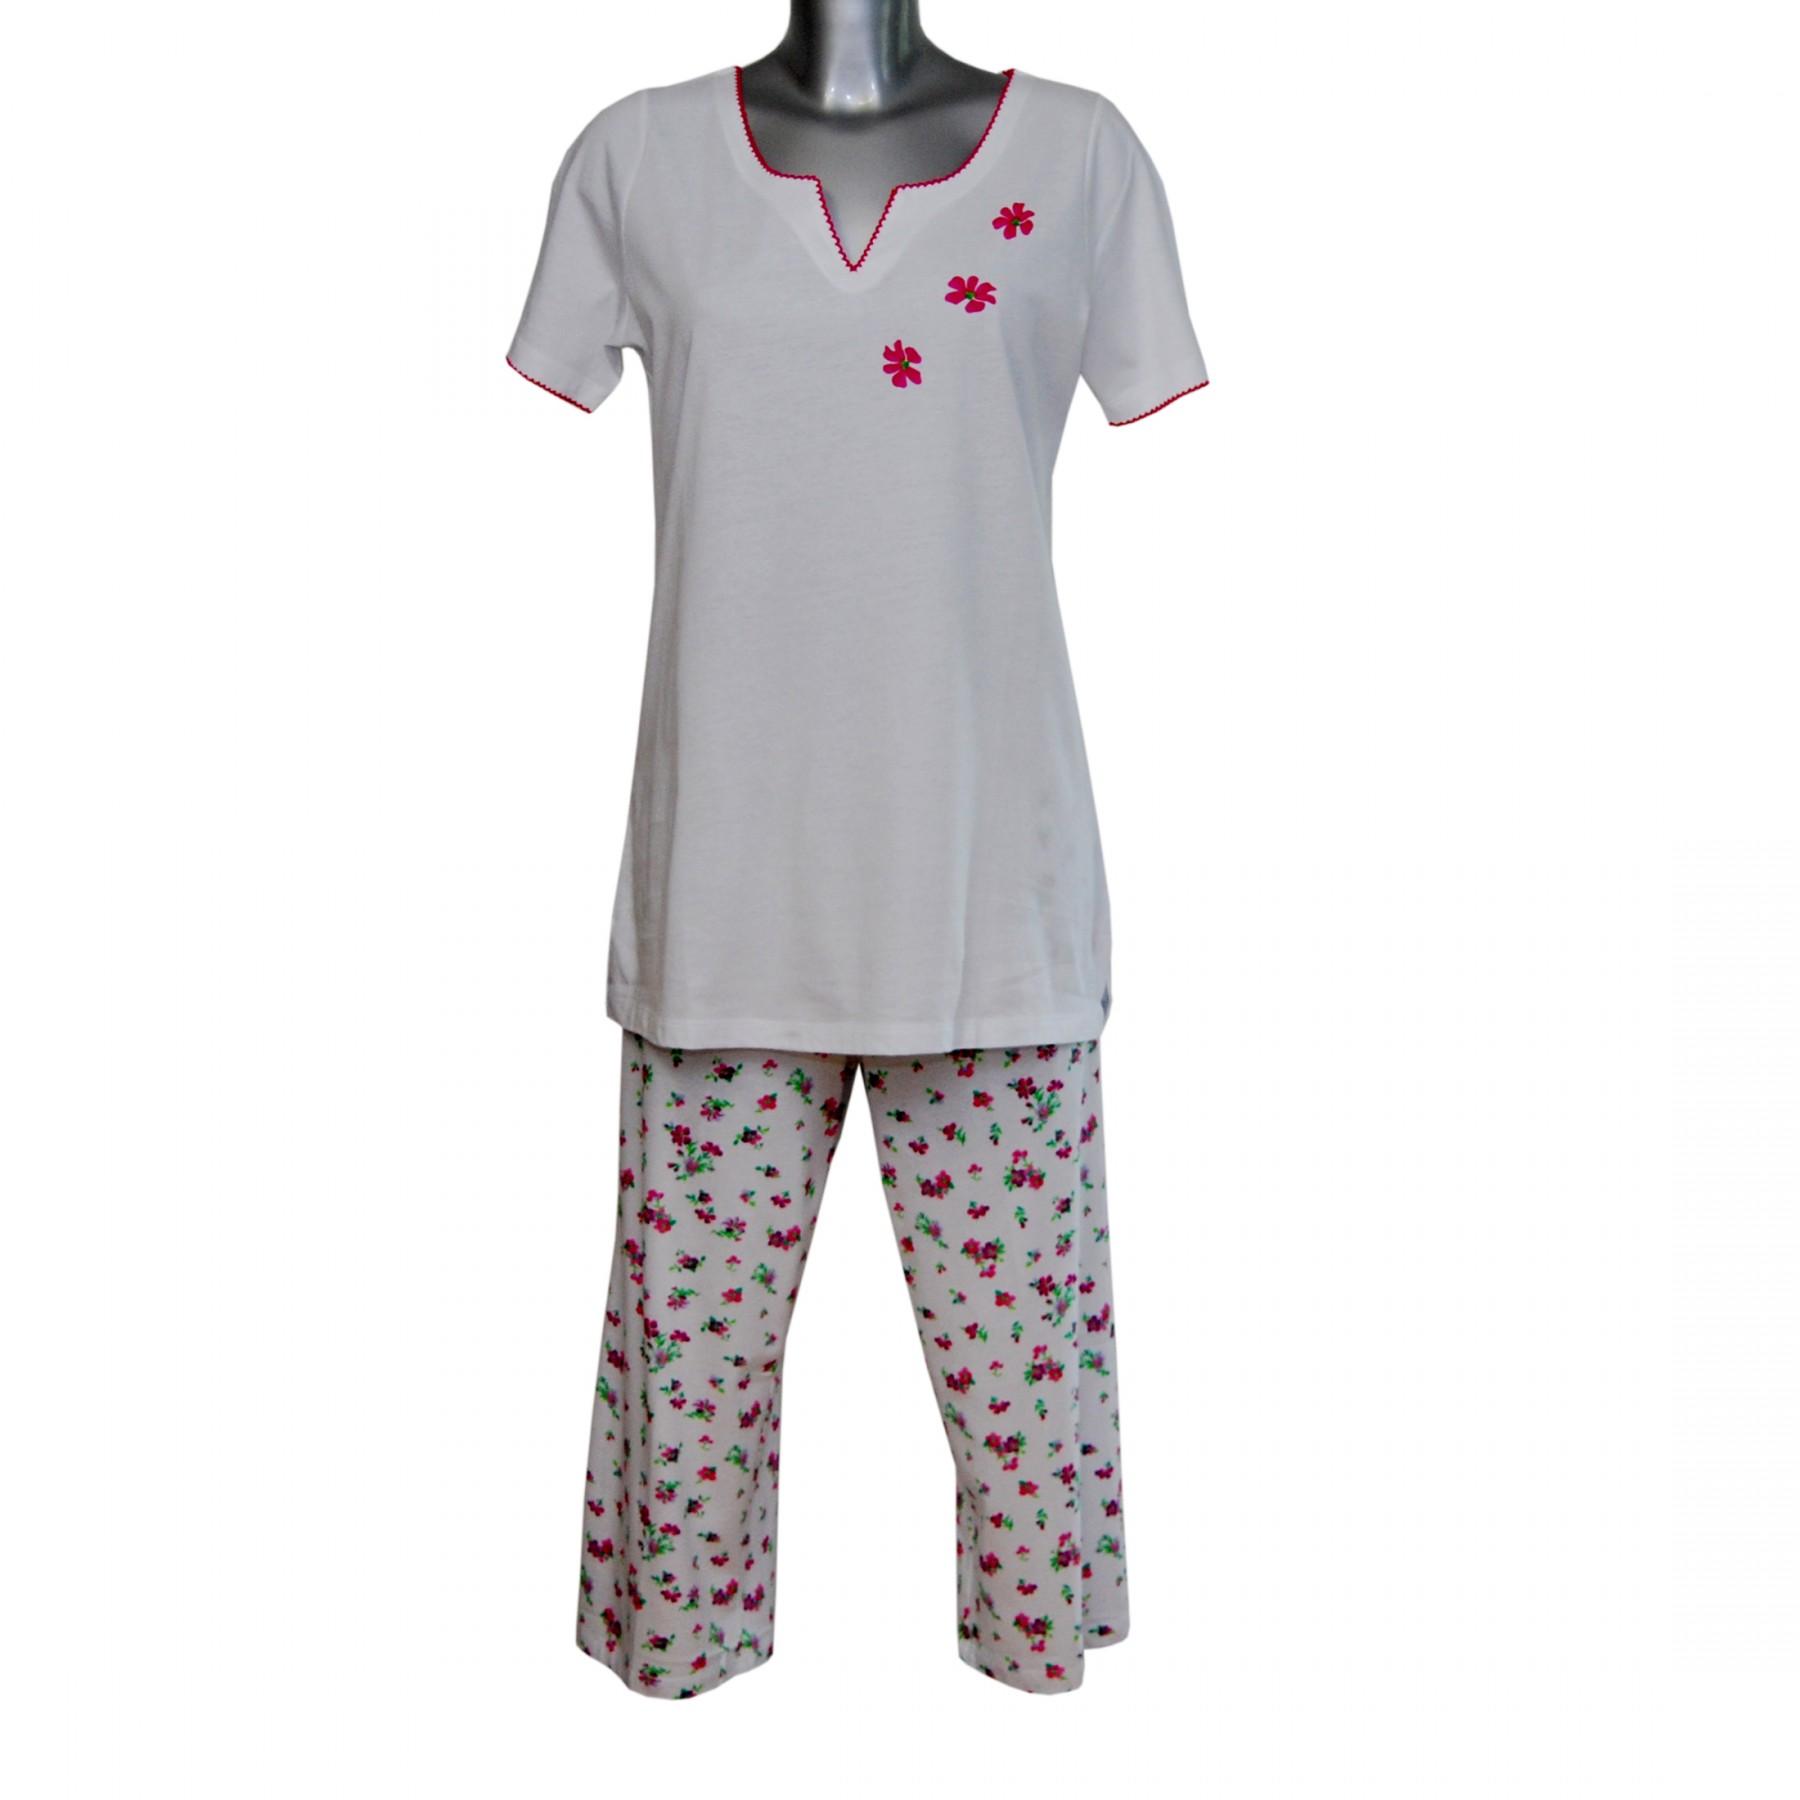 MelanieM Damen Pyjama 3 4 lang kurzarm Caprihose reine Baumwolle ... 5756e88b93